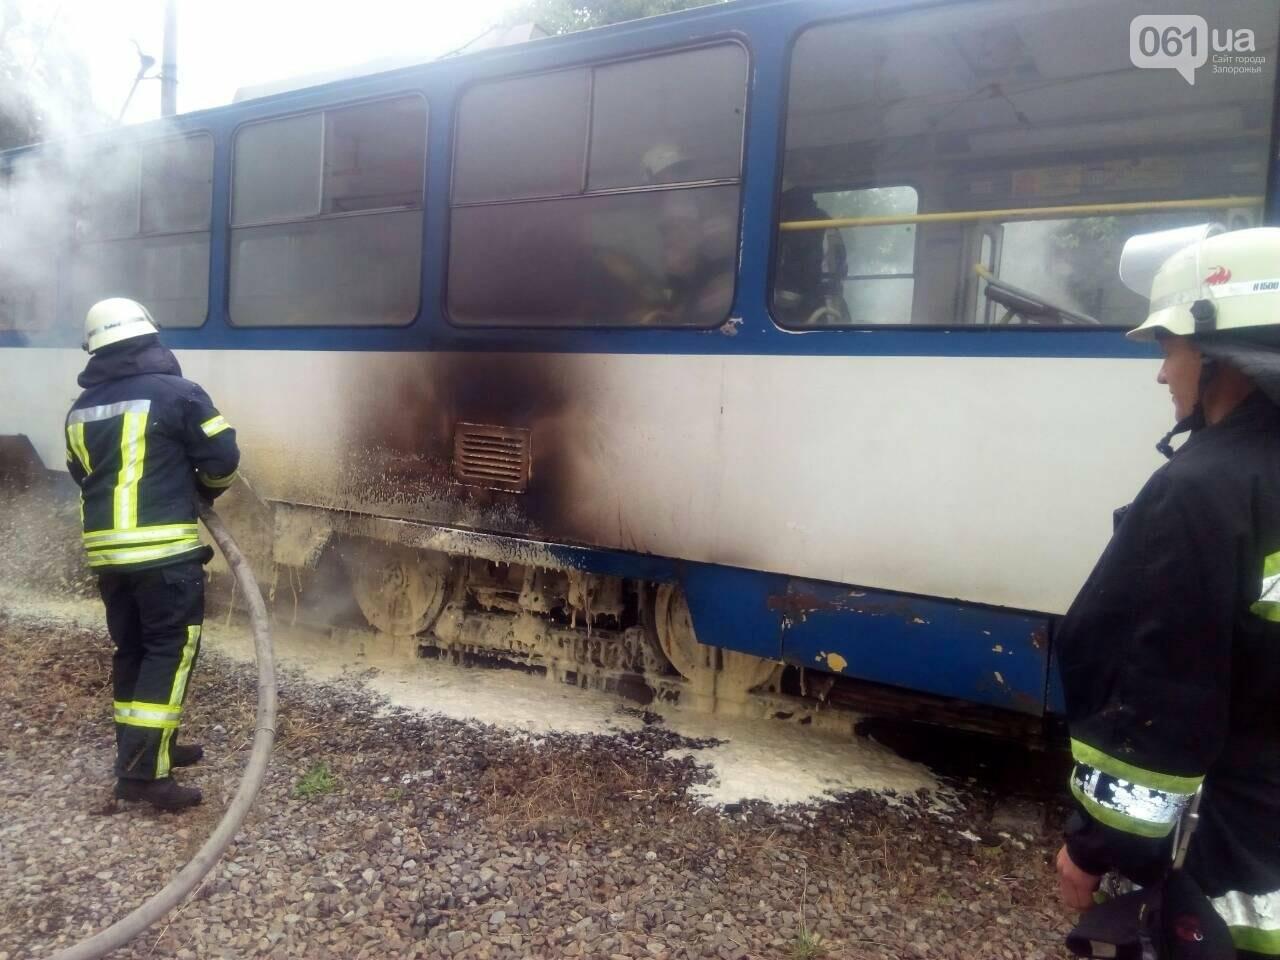 В Заводском районе Запорожья загорелся трамвай, - ФОТО, фото-1